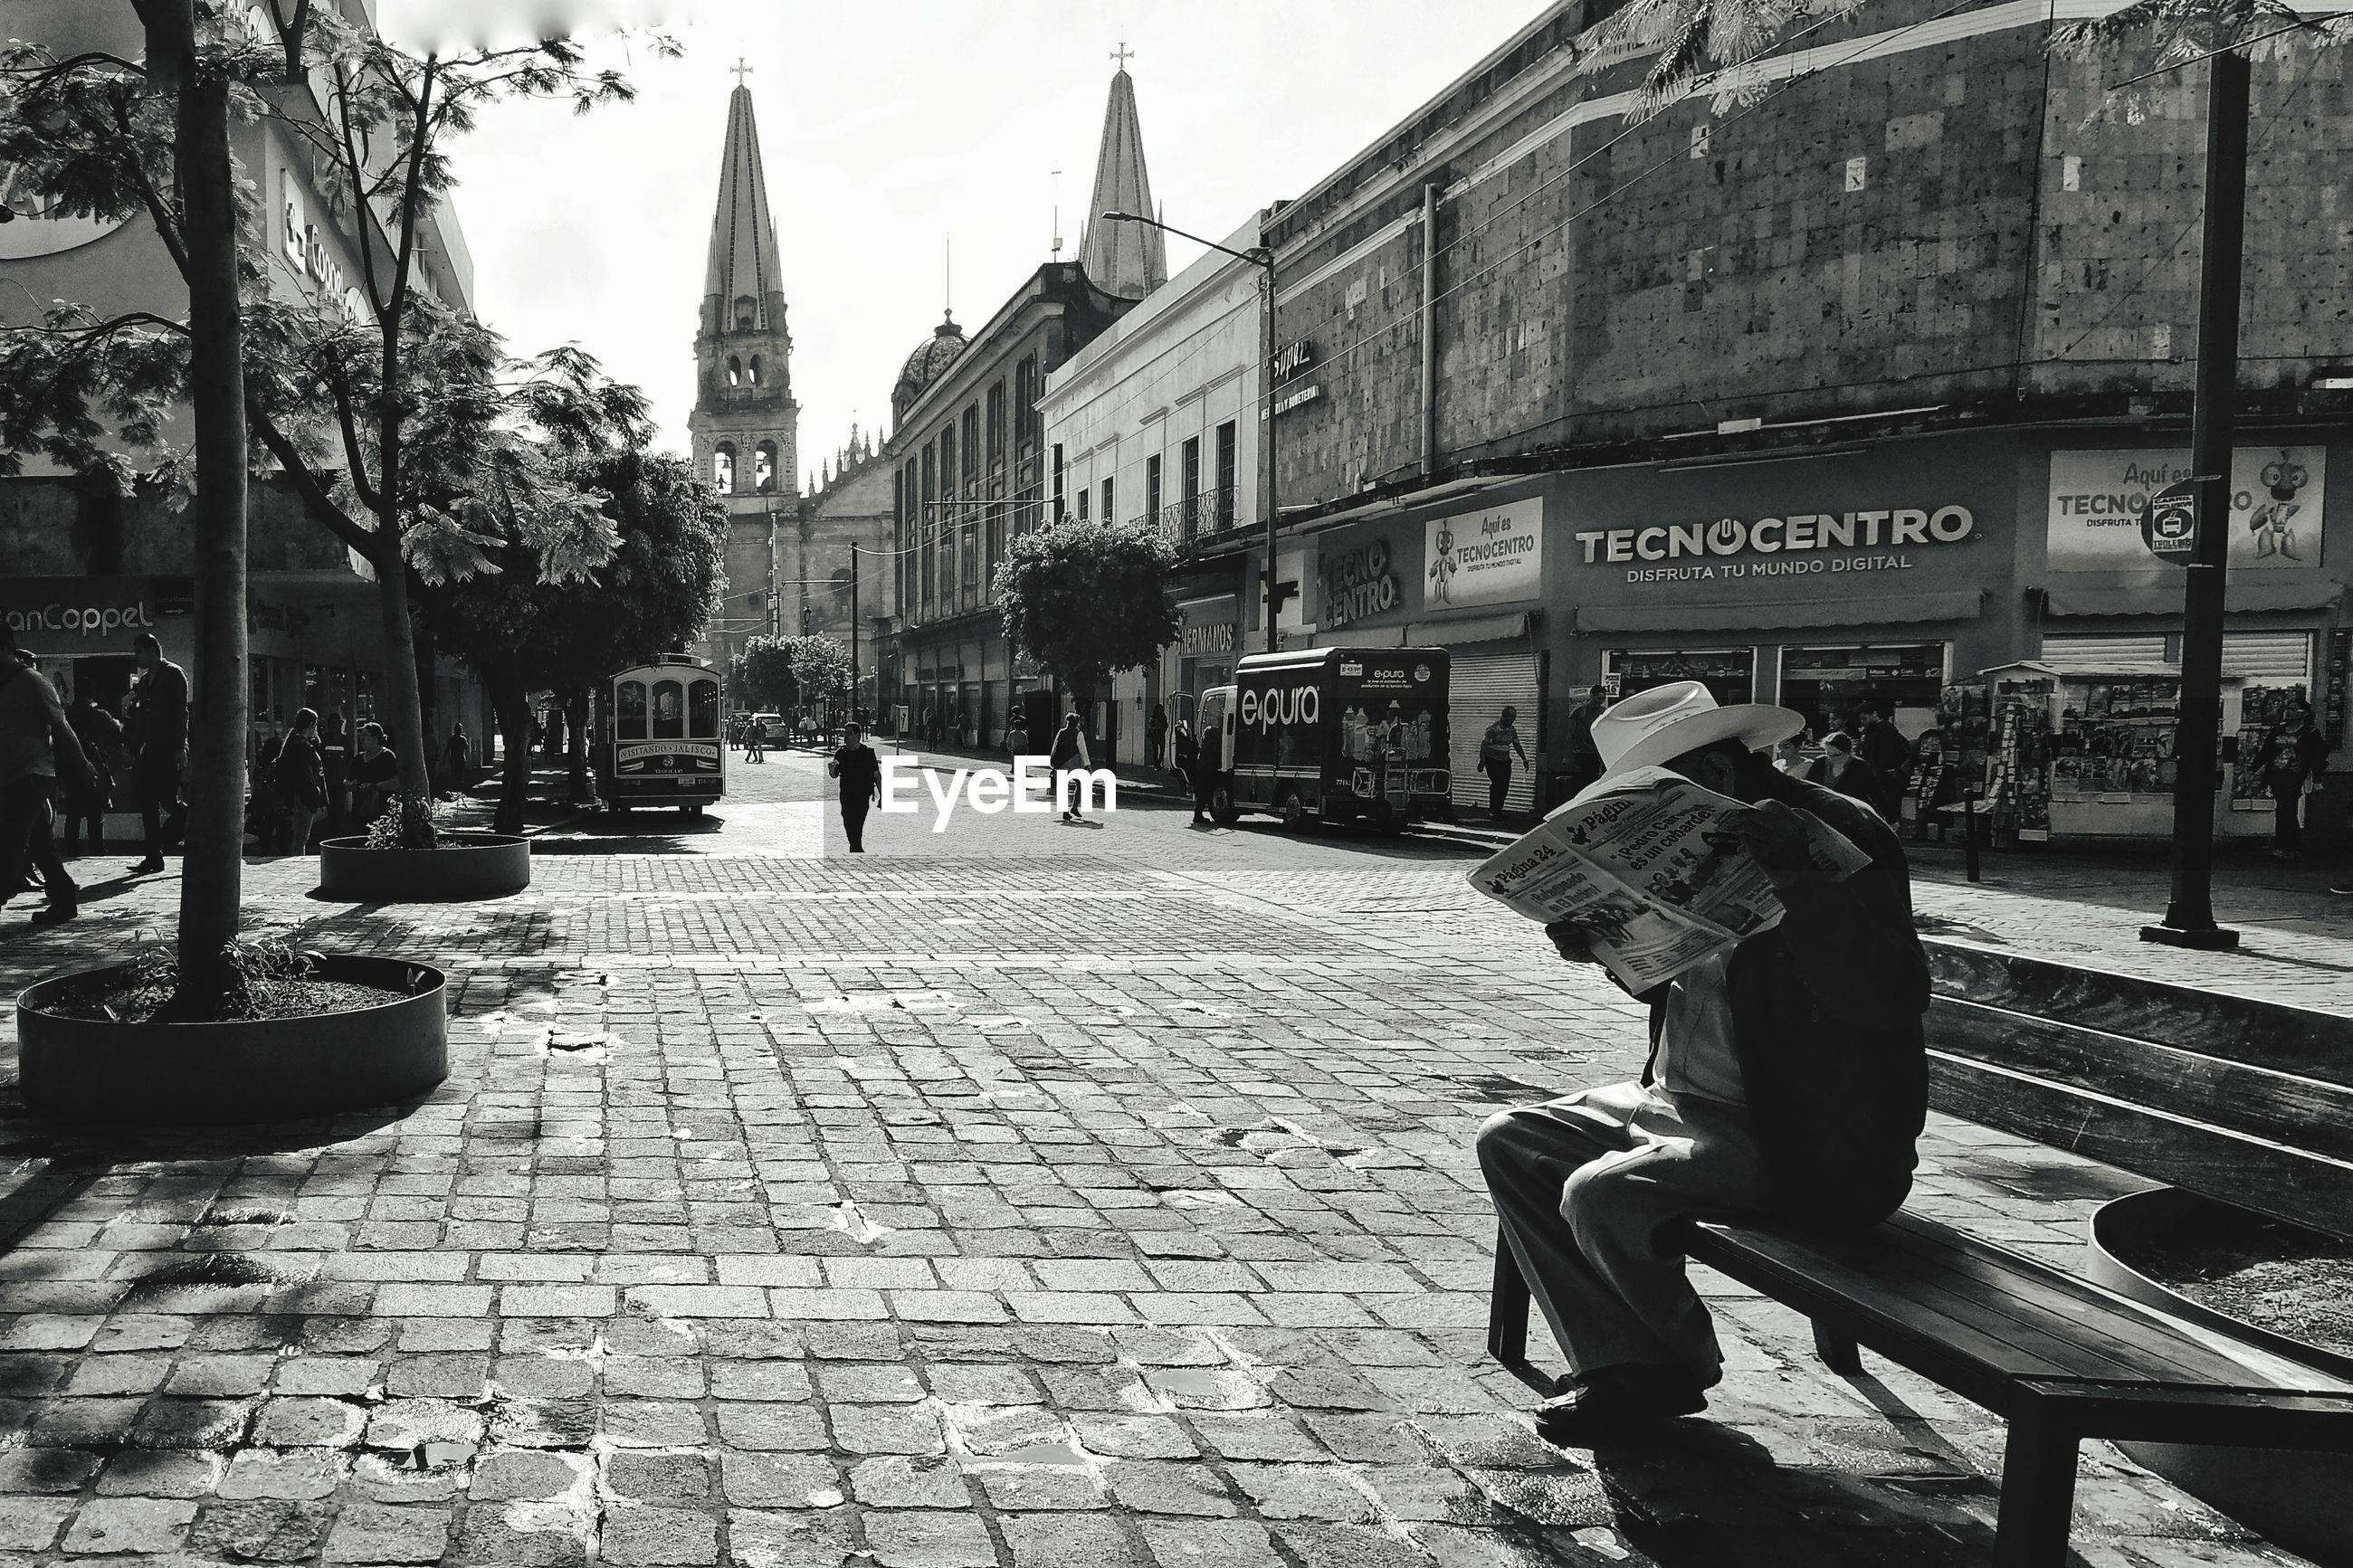 PEOPLE SITTING ON FOOTPATH BY BUILDINGS